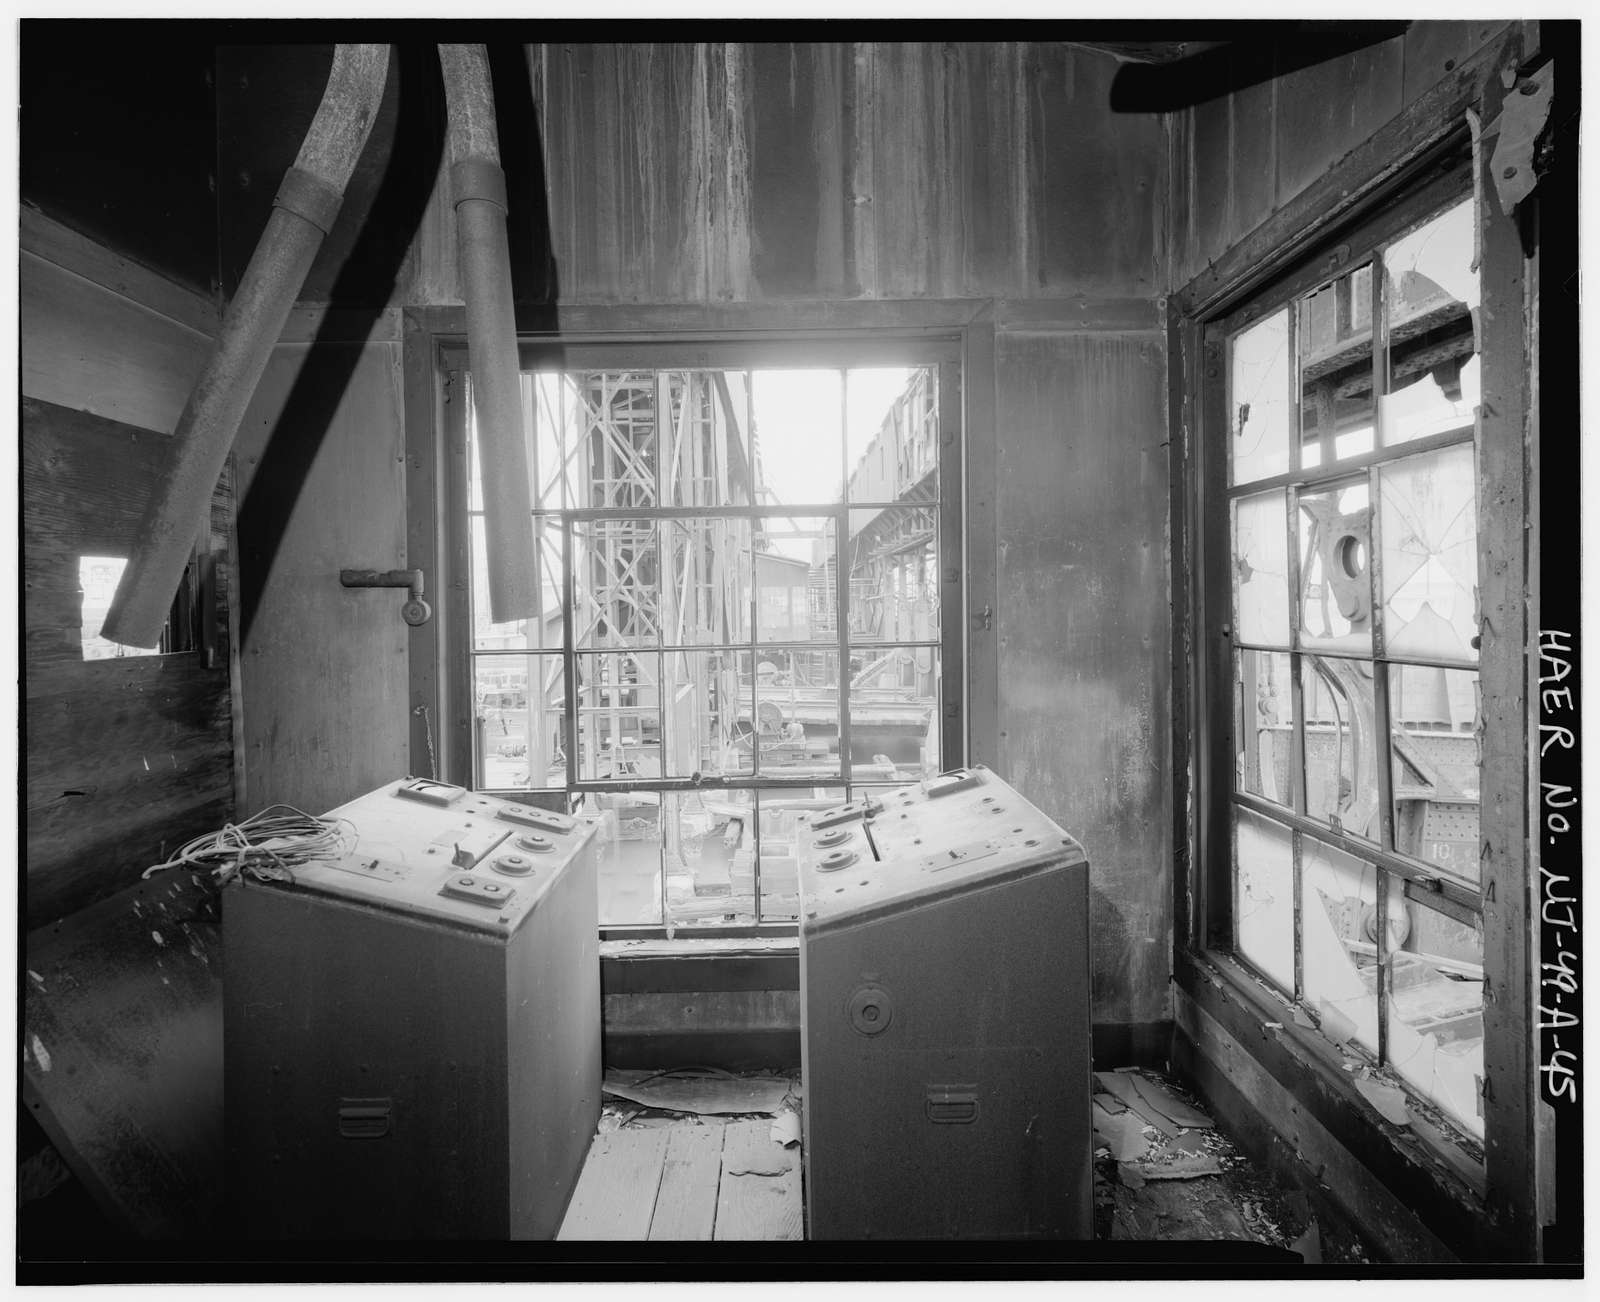 Greenville Yard, Transfer Bridge System, Port of New York/New Jersey, Upper New York Bay, Jersey City, Hudson County, NJ